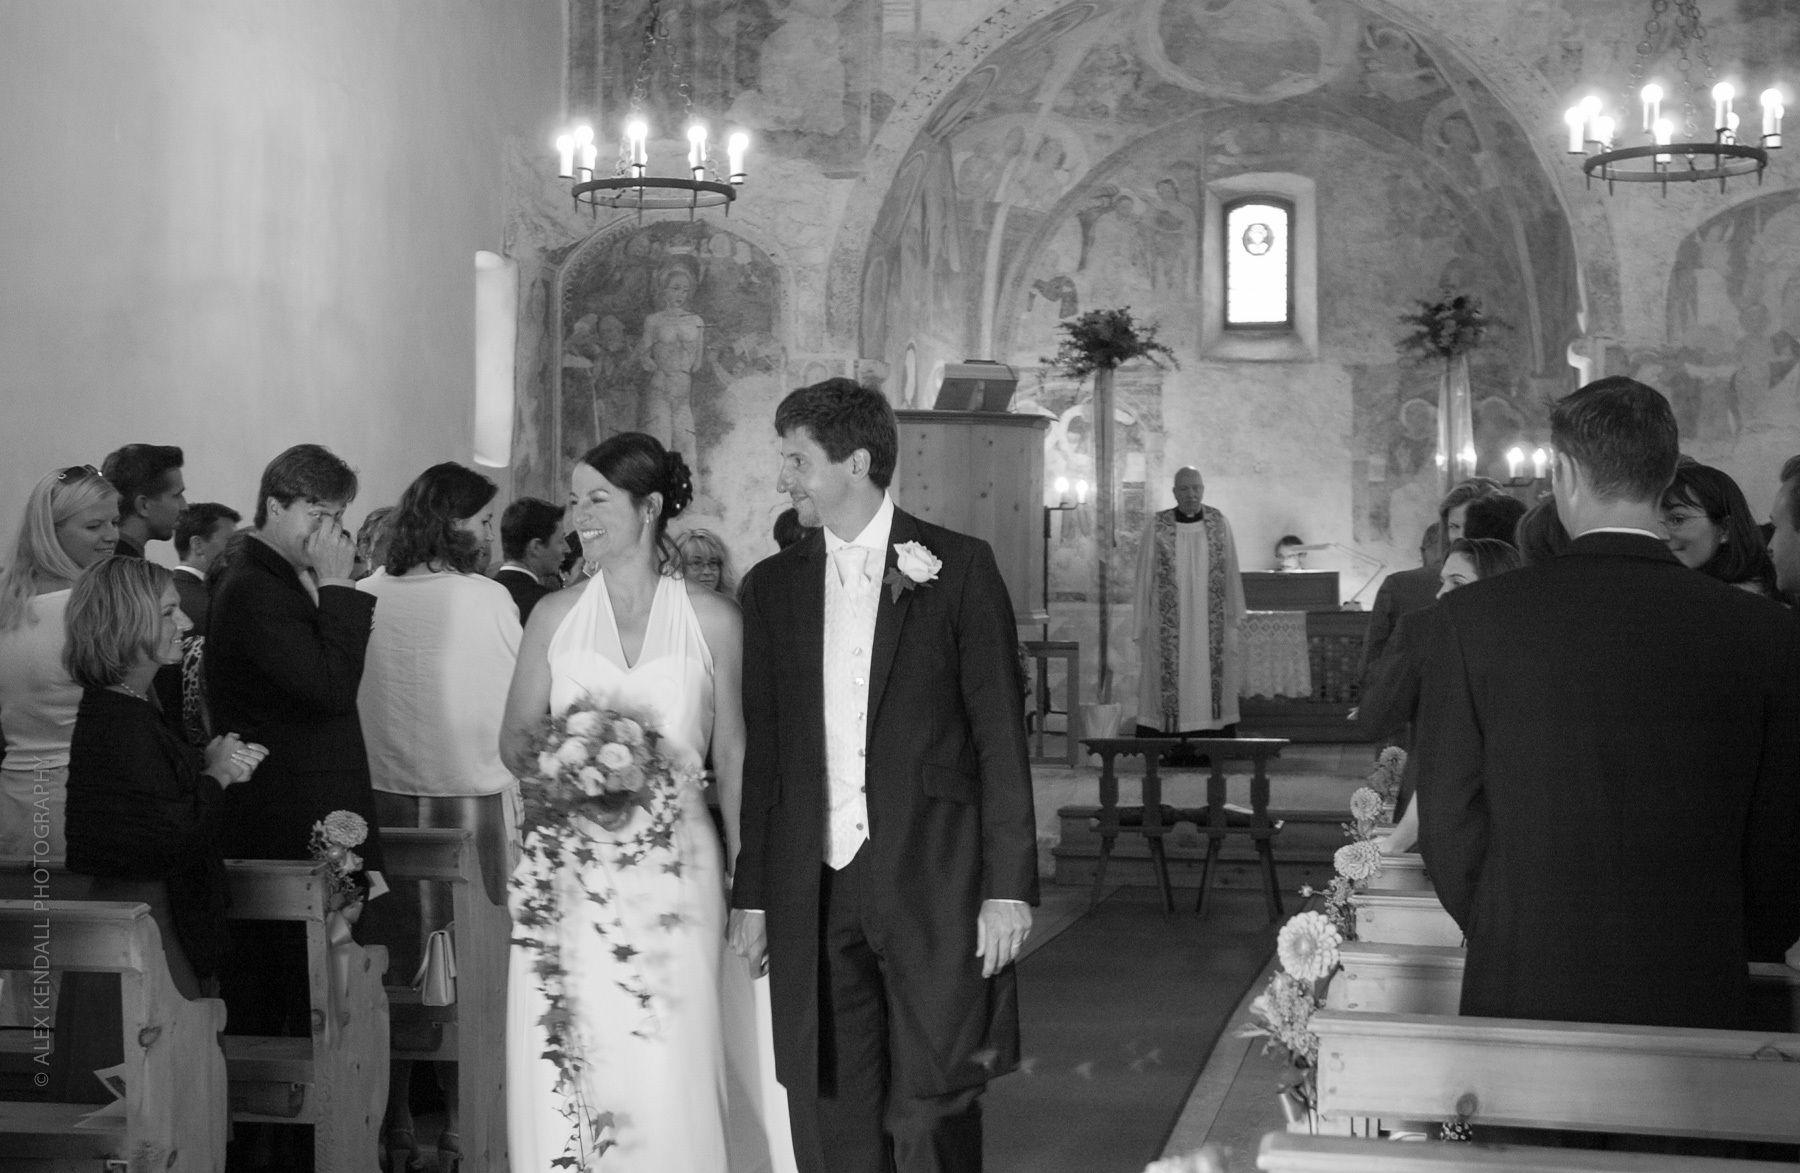 11-alex_kendall_photography__breckenridge_colorado__dog_photography__pet_photography__wedding_photography__family_portraits__sports_photography__senior_portraits__family_reunion_photographer_1